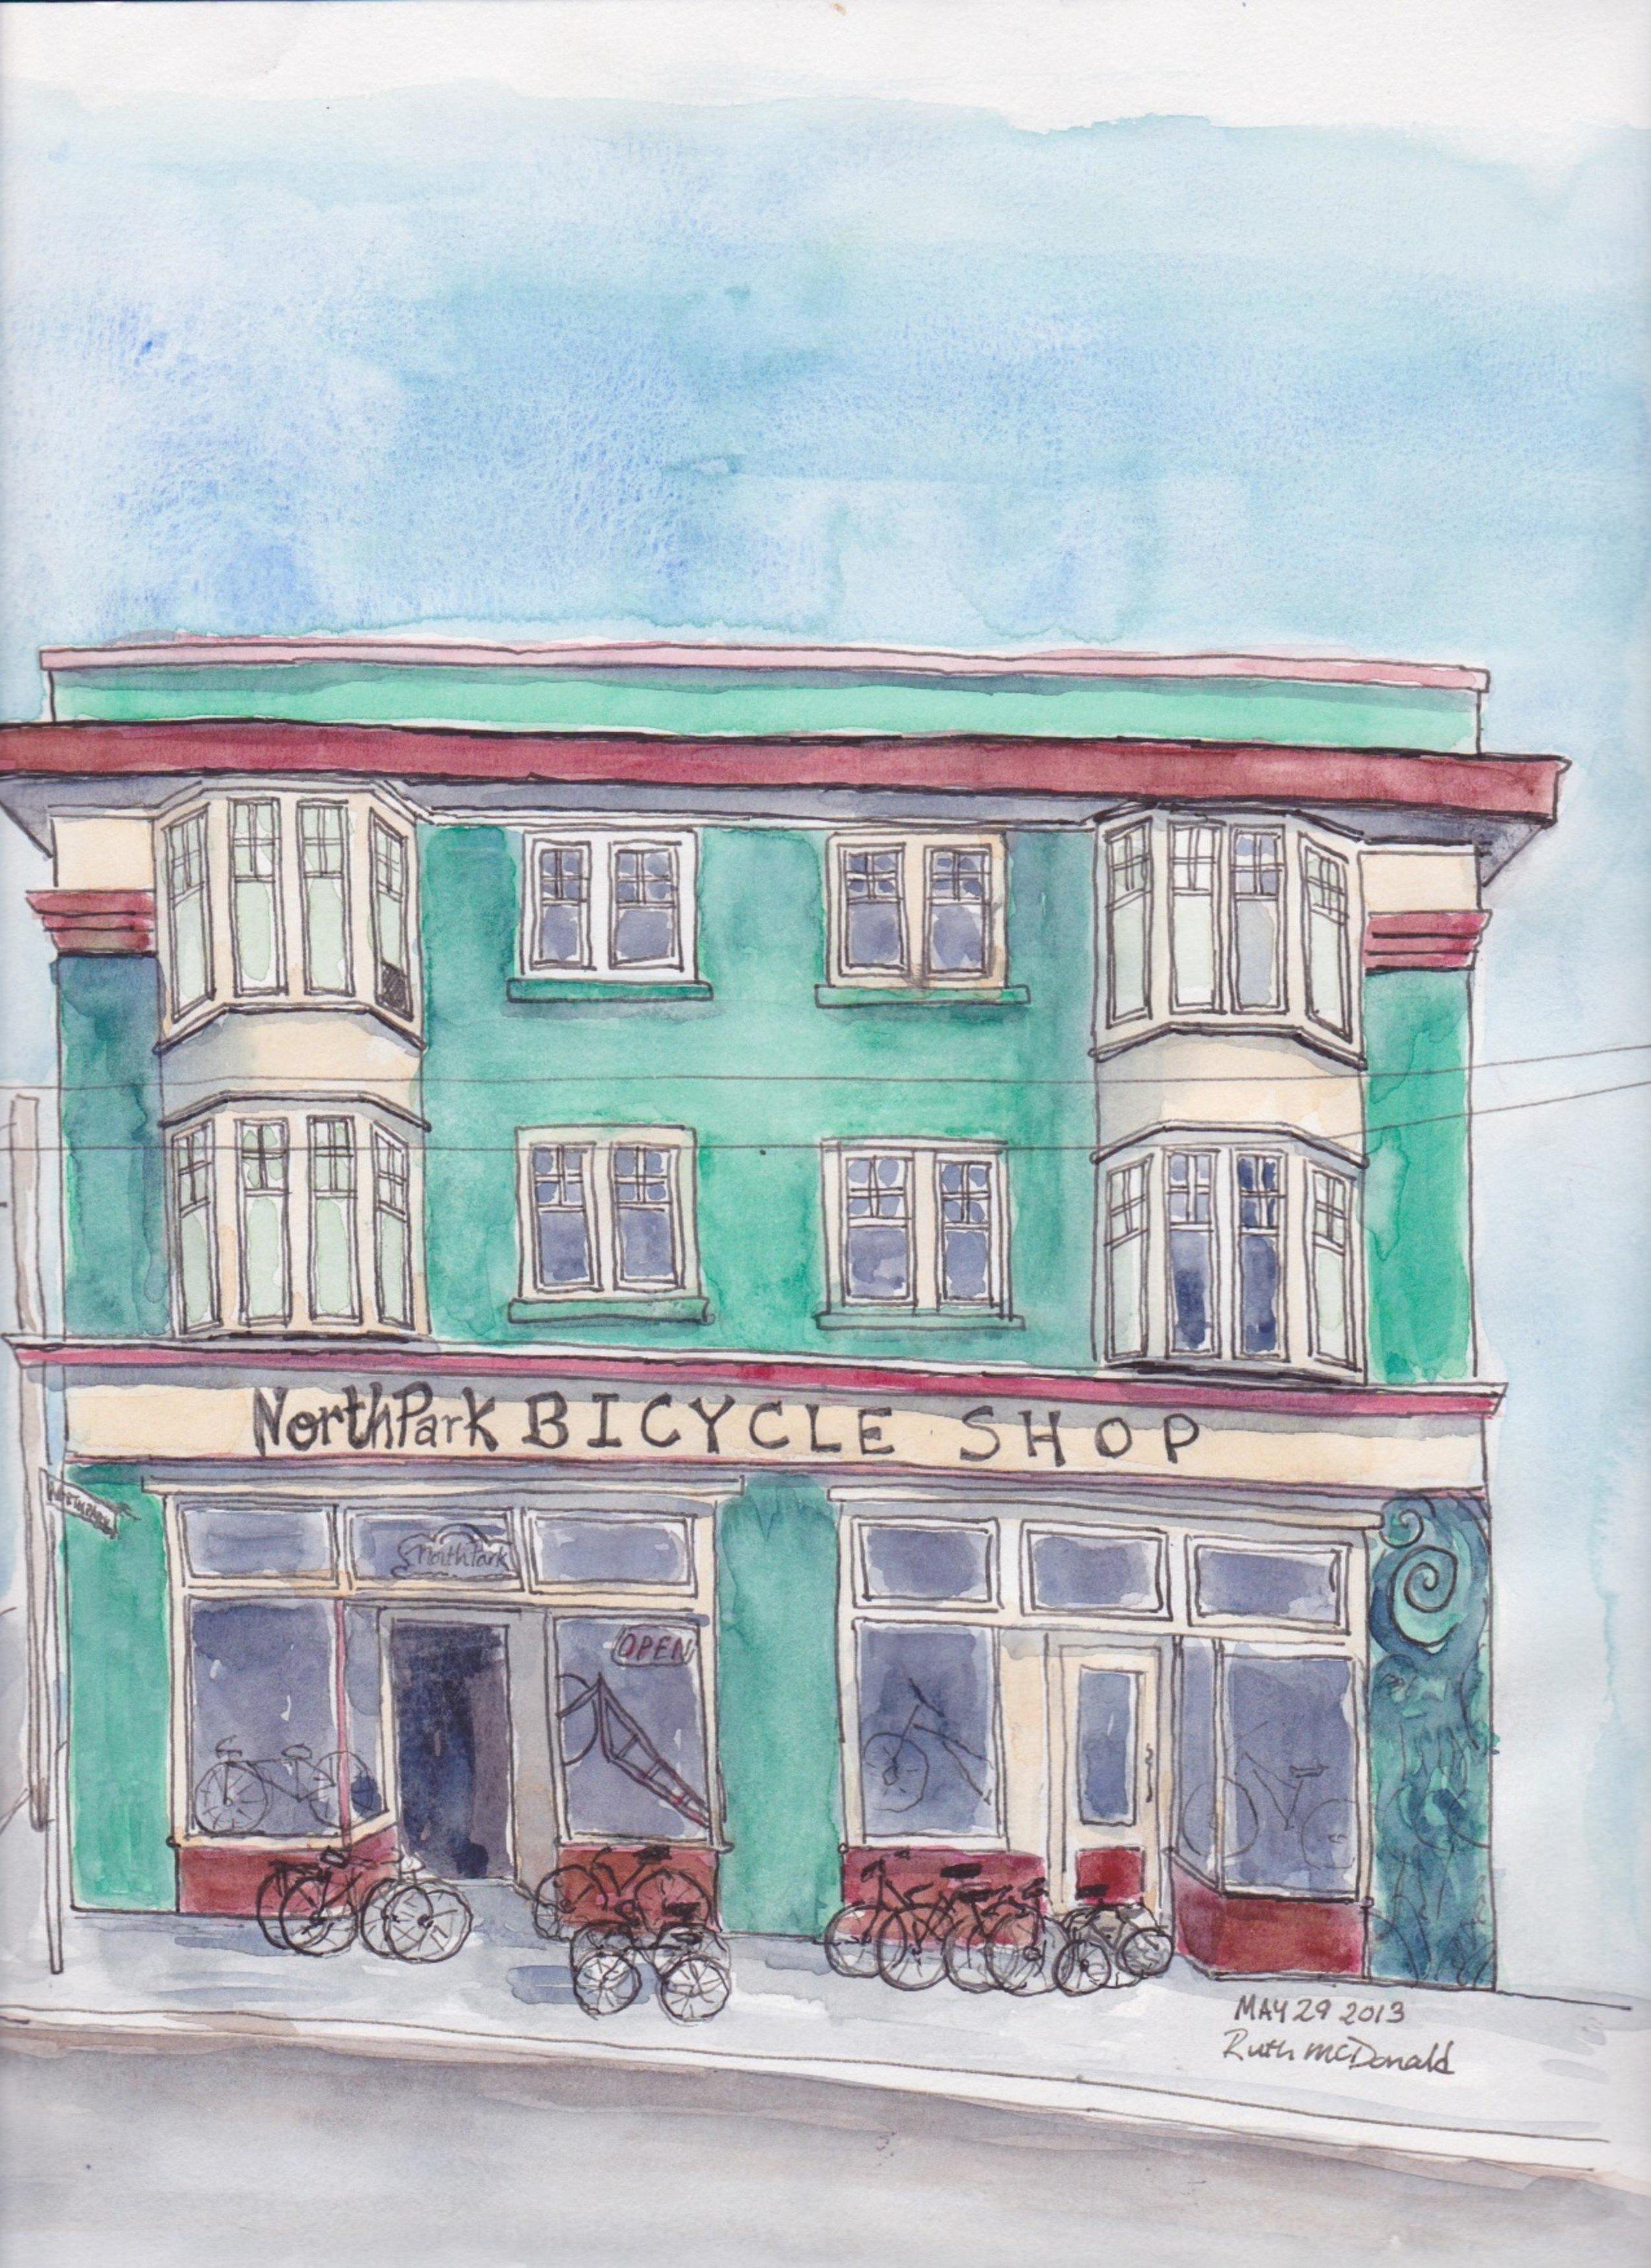 Ruth McDonald watercolour-page-001.jpg